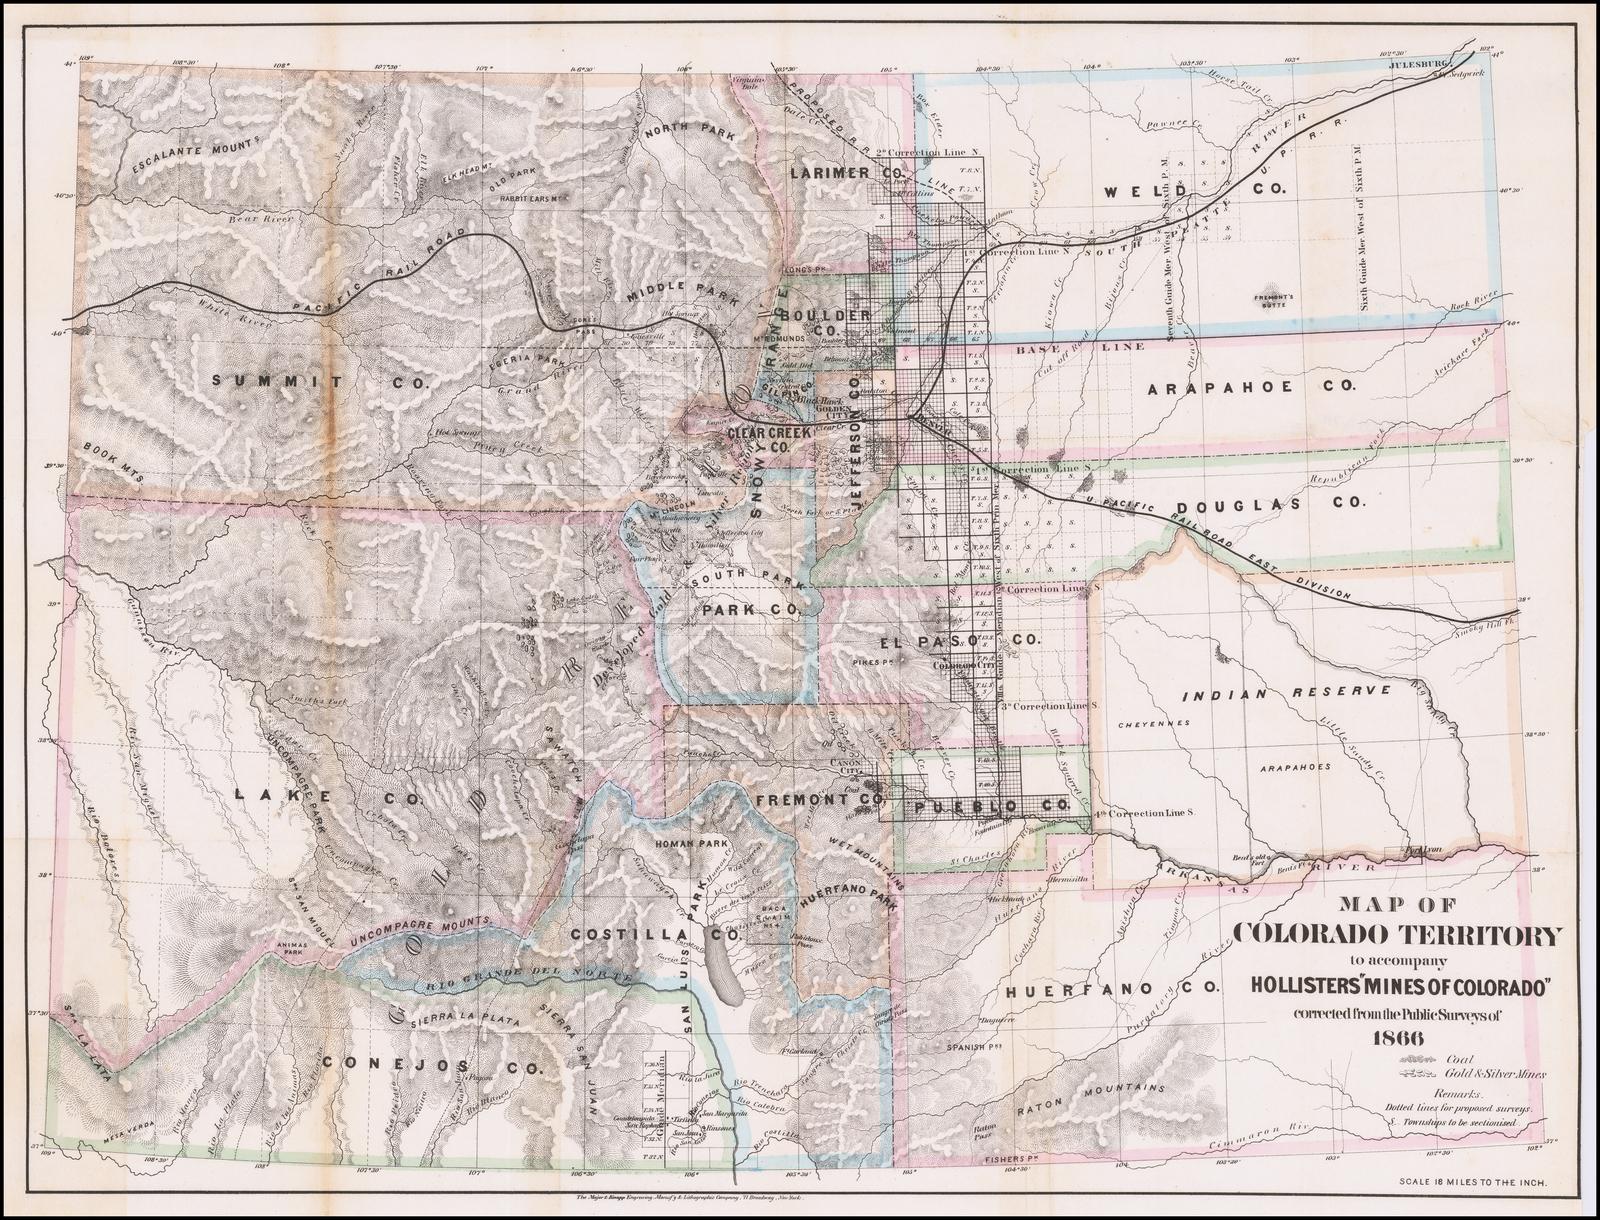 Map of Colorado Territory to accompany Holisters